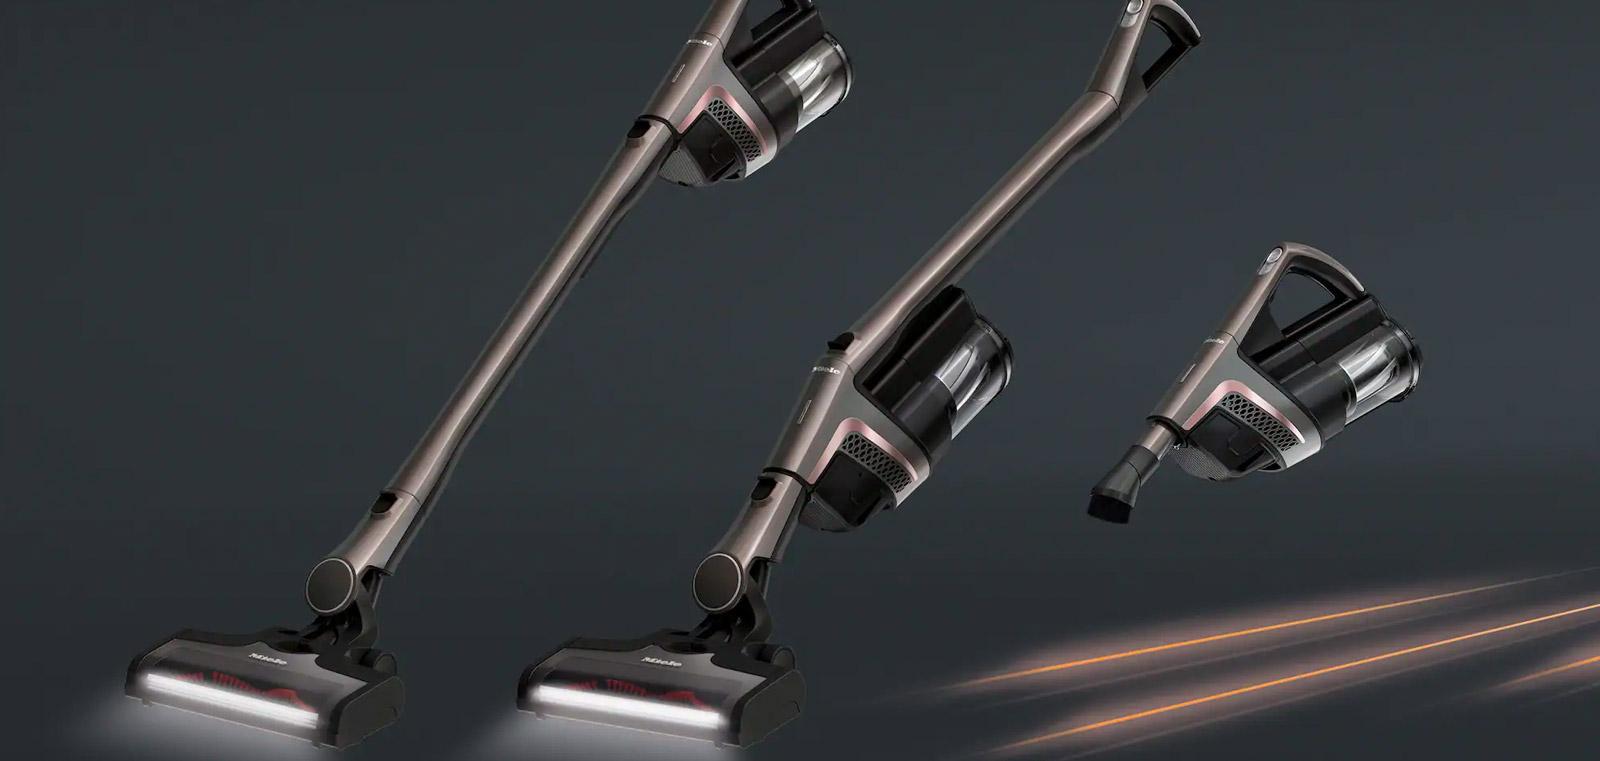 Miele TriFlex Bagless Stick Vacuums